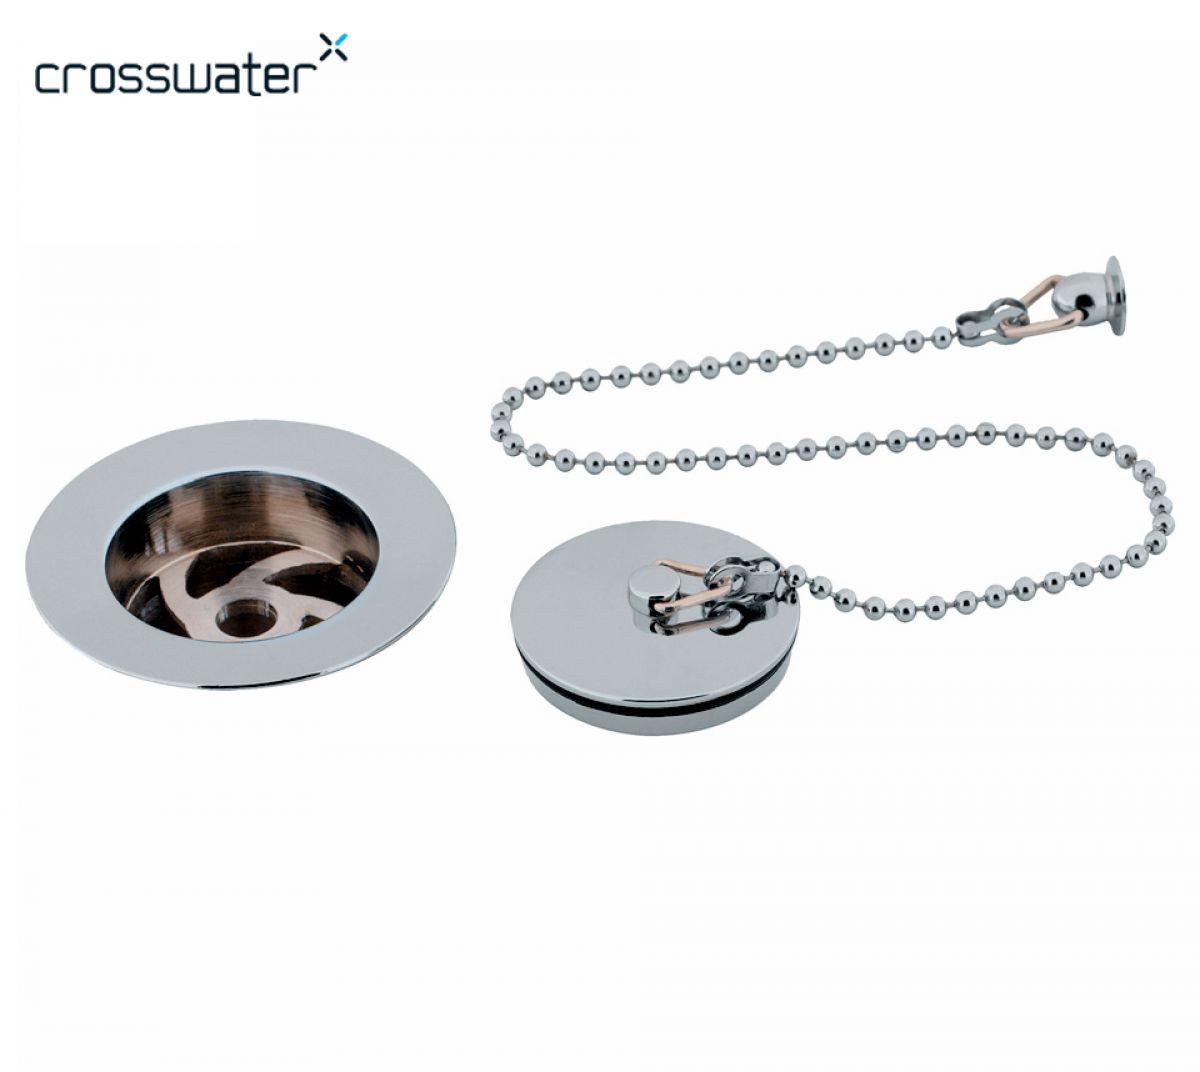 Crosswater Plug & Chain Basin Waste